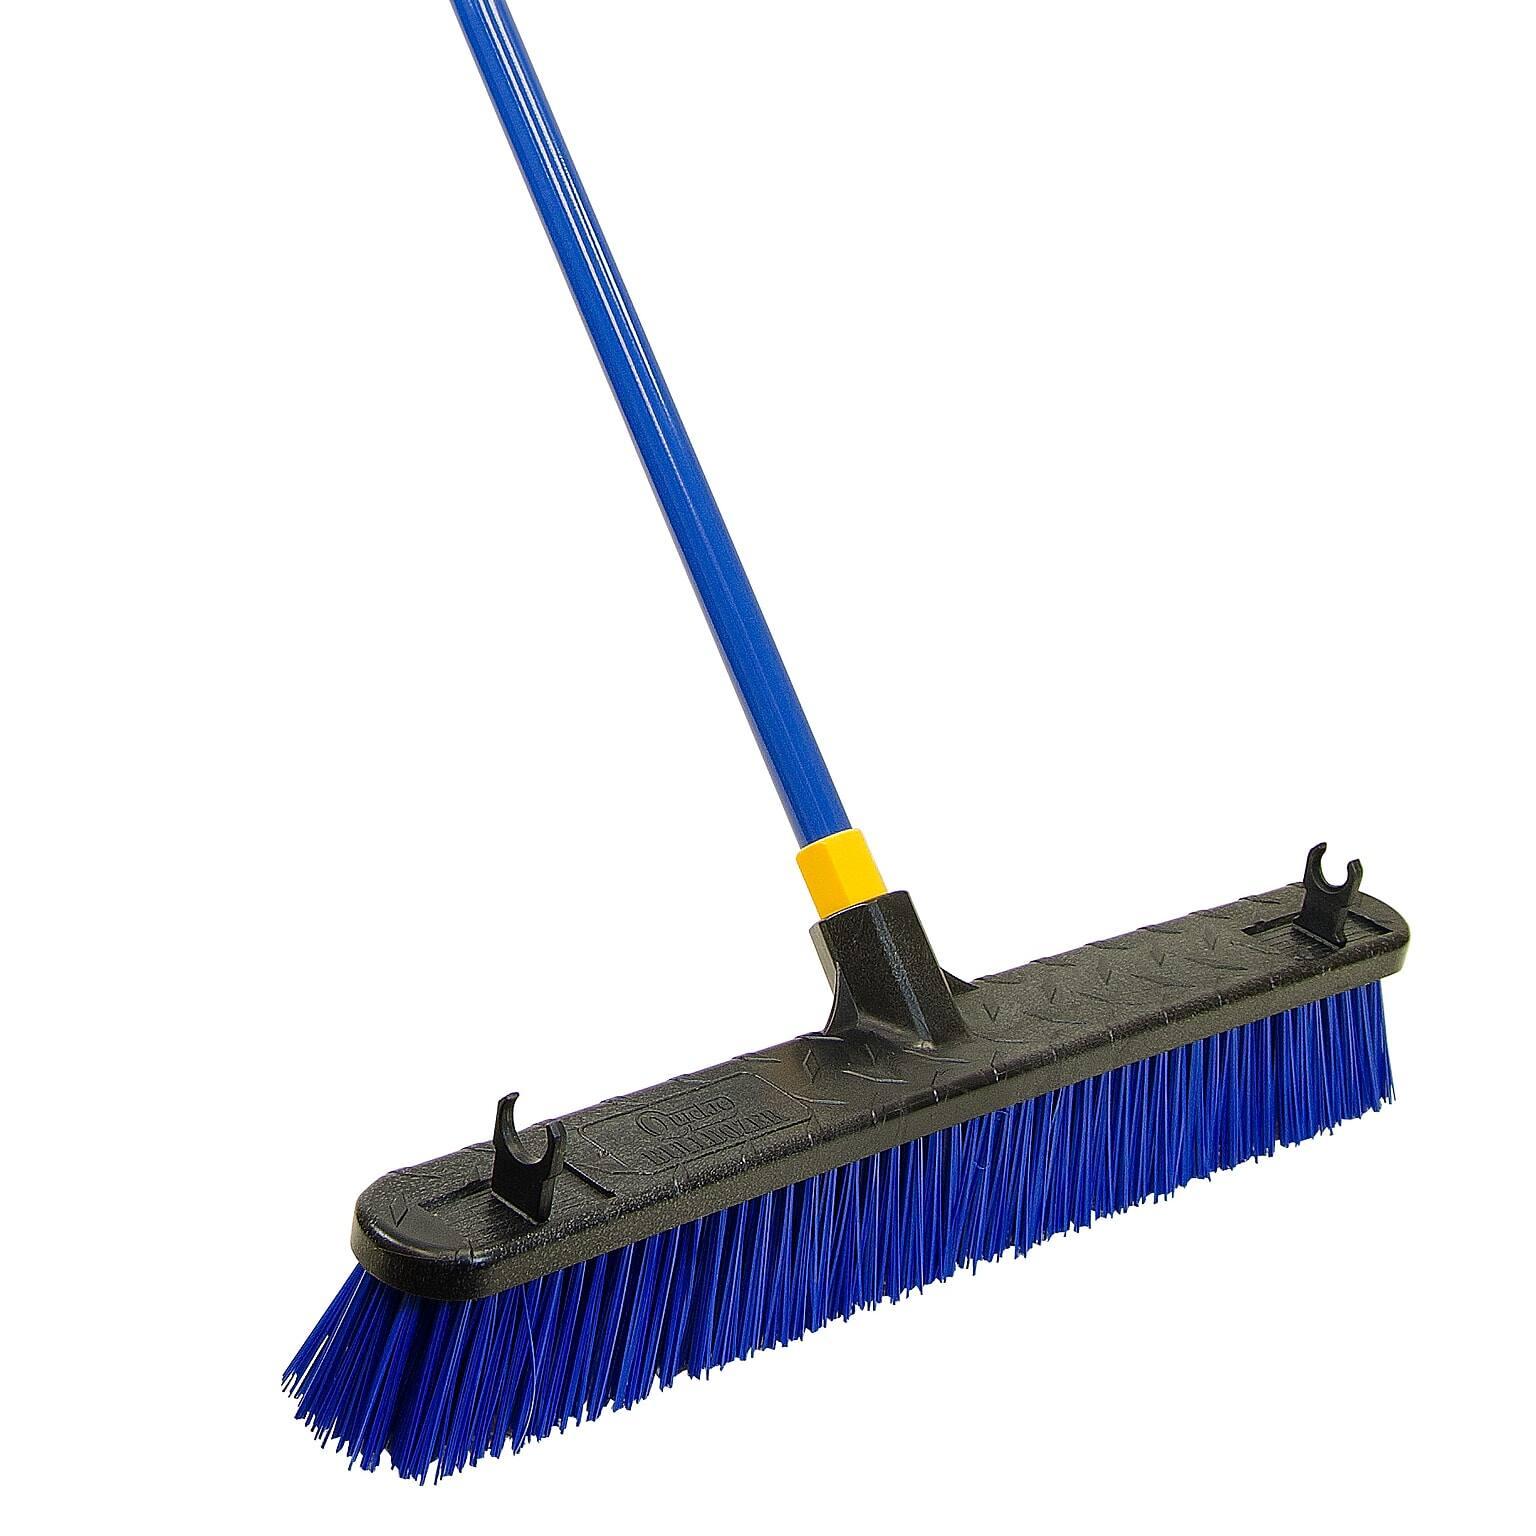 "*Back* Quickie Bulldozer 24"" Rough Surface Push Broom $7.85 + Free Shipping"